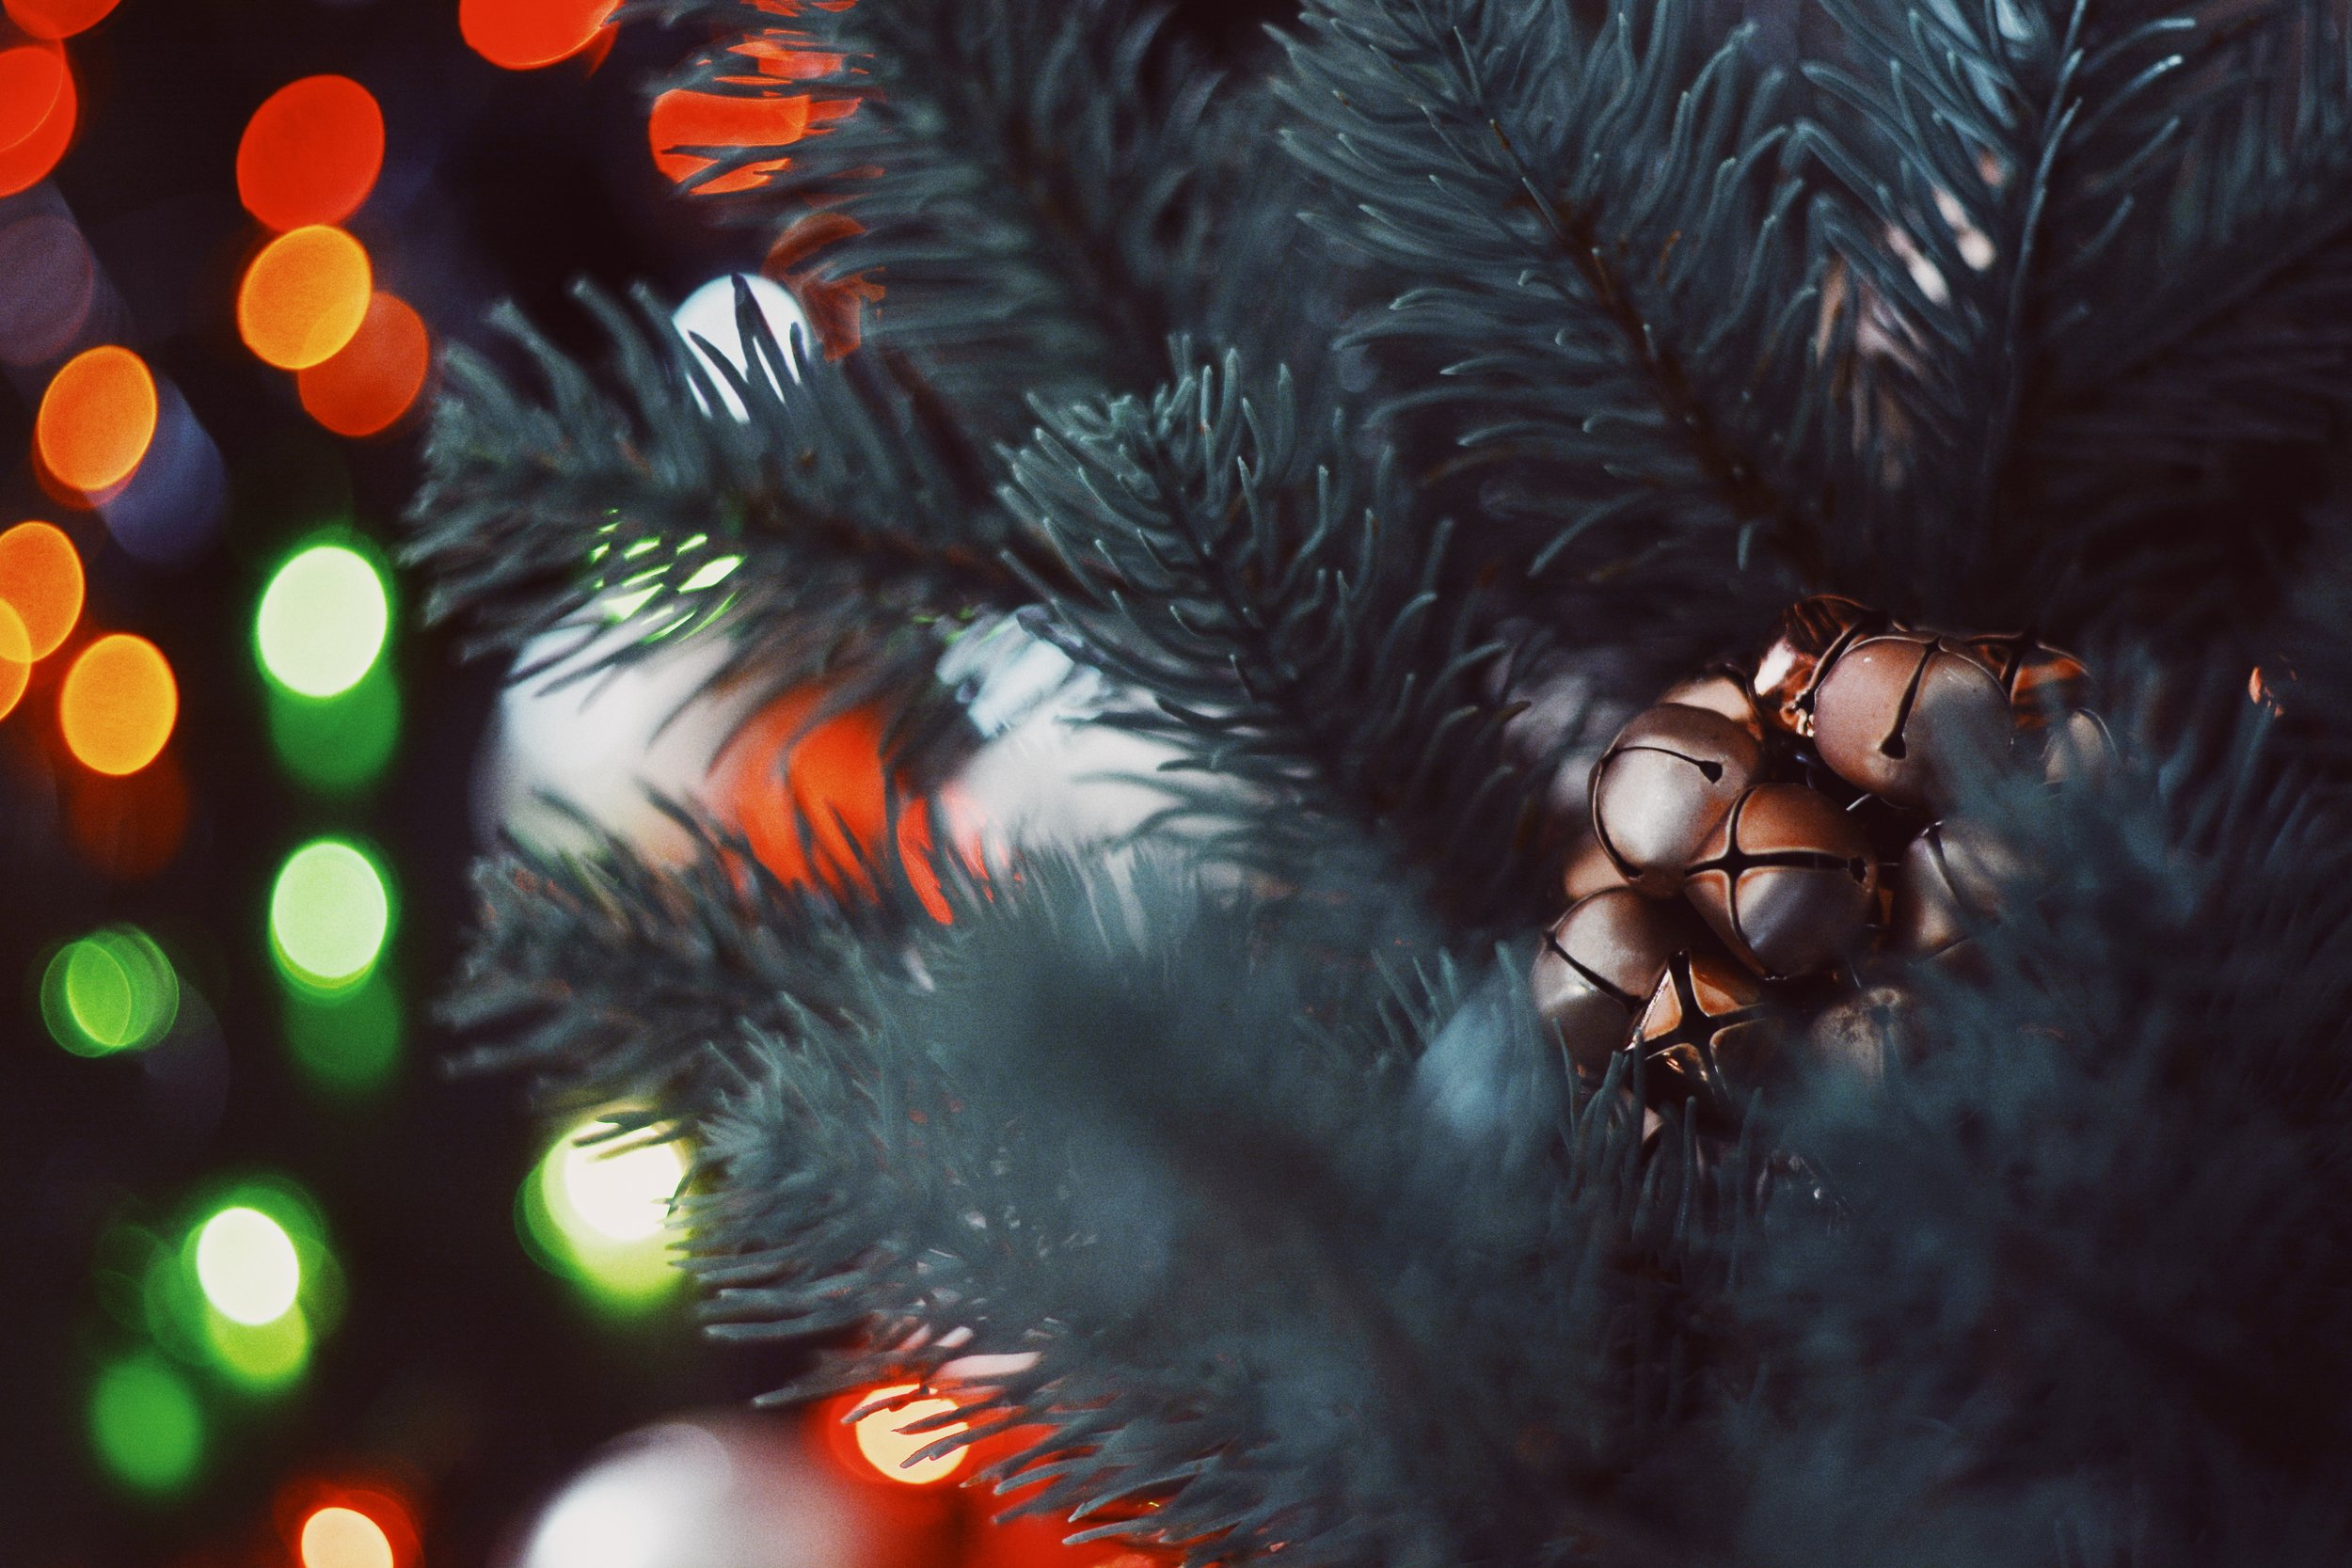 A_living_christmas_co_12 Jpg